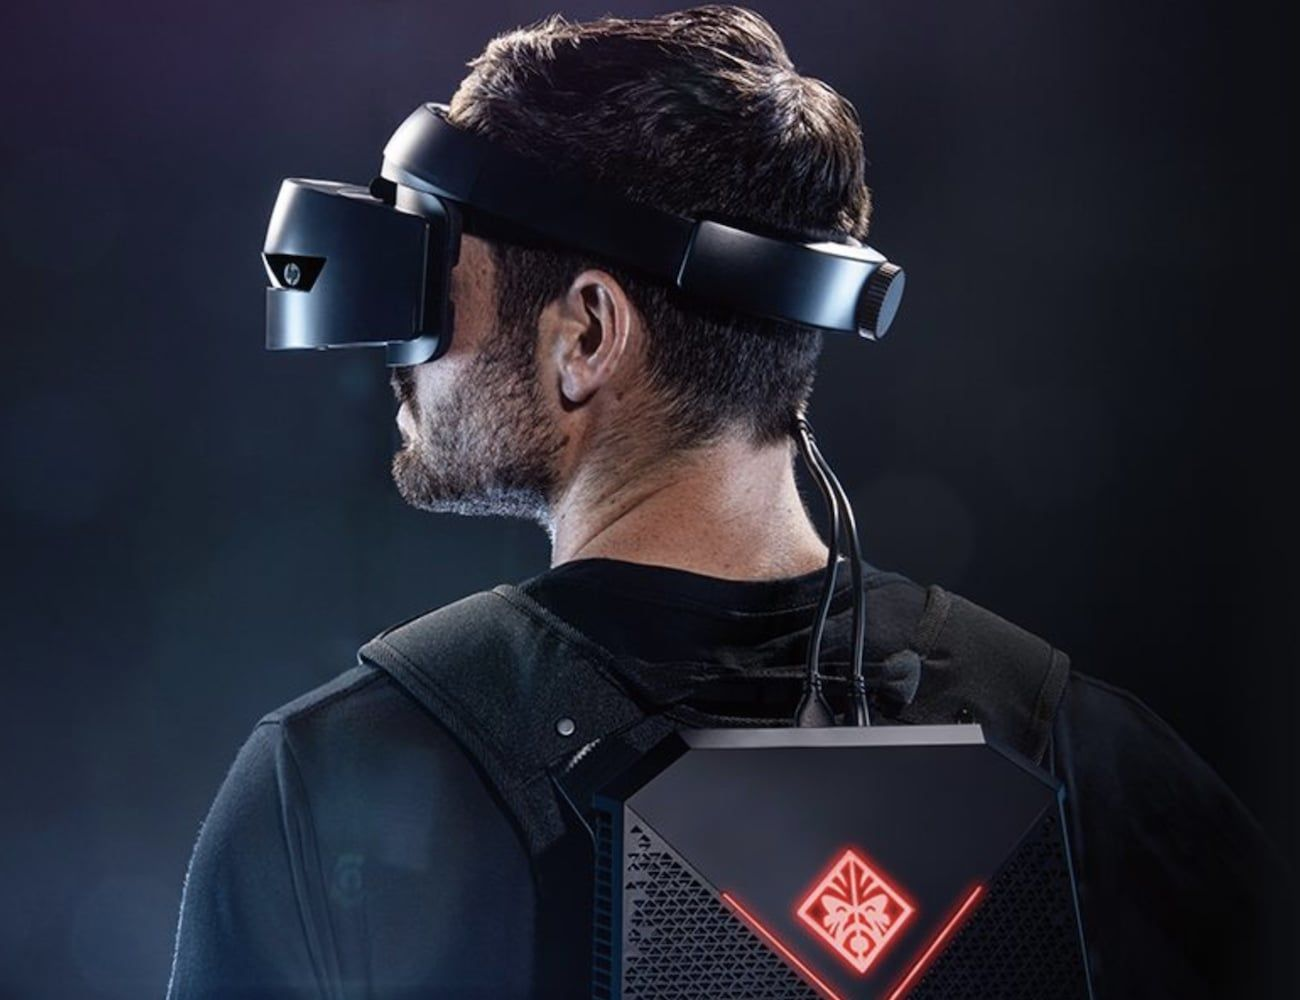 Hp Windows Mixed Reality Headset Virtual Reality Augmented Virtual Reality Virtual Reality Design